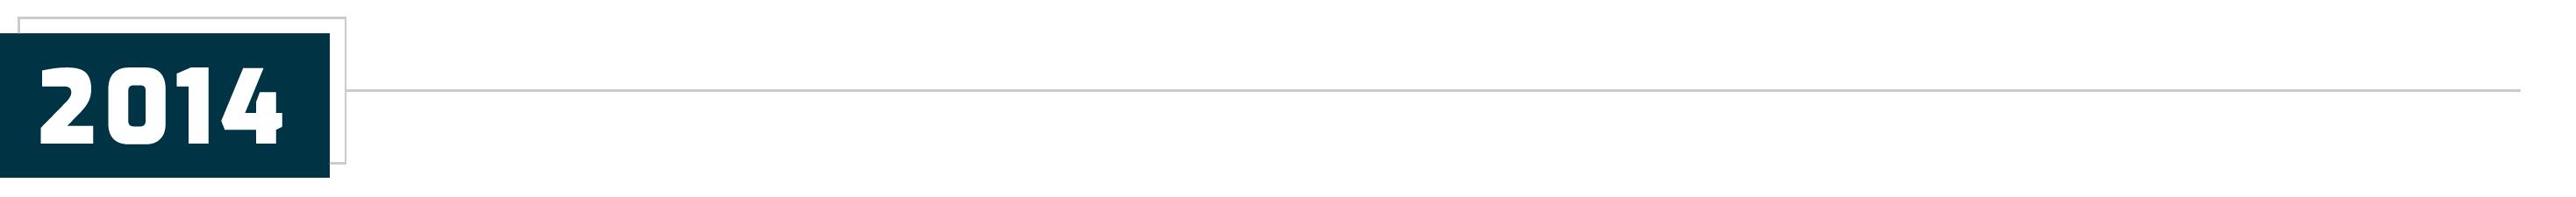 Choice Bank Timeline 2014